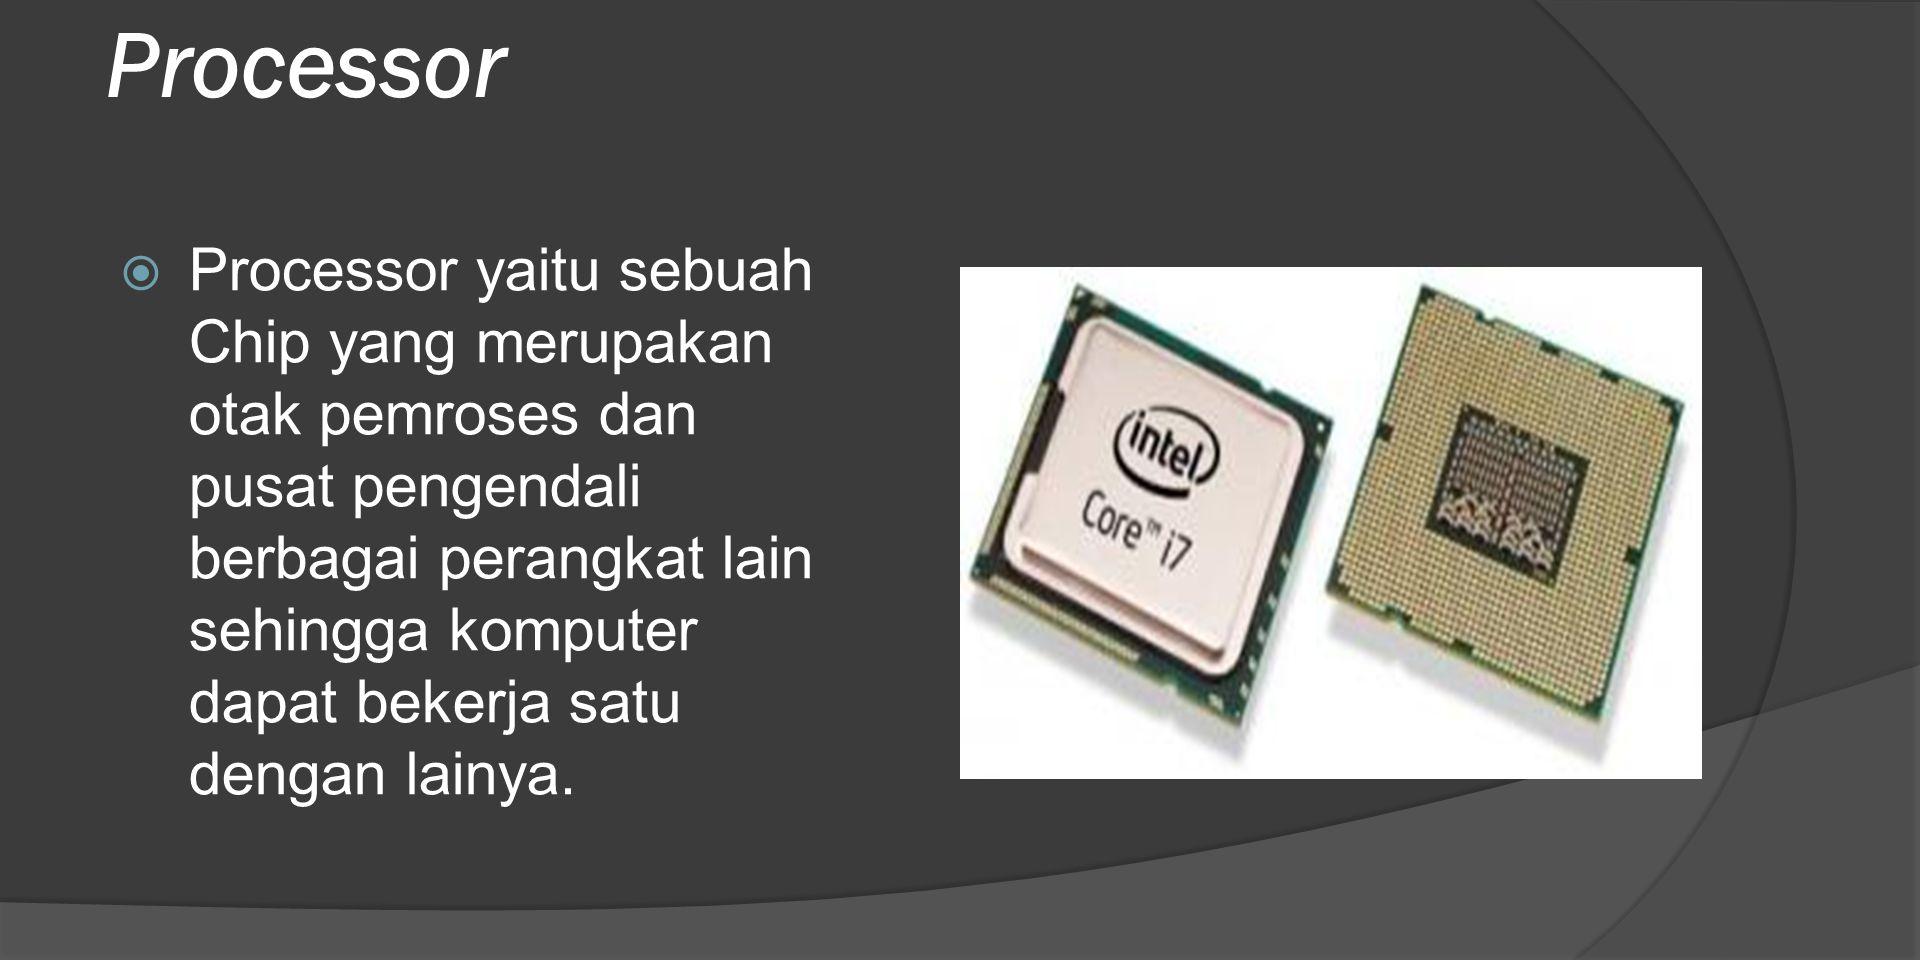 Processor  Processor yaitu sebuah Chip yang merupakan otak pemroses dan pusat pengendali berbagai perangkat lain sehingga komputer dapat bekerja satu